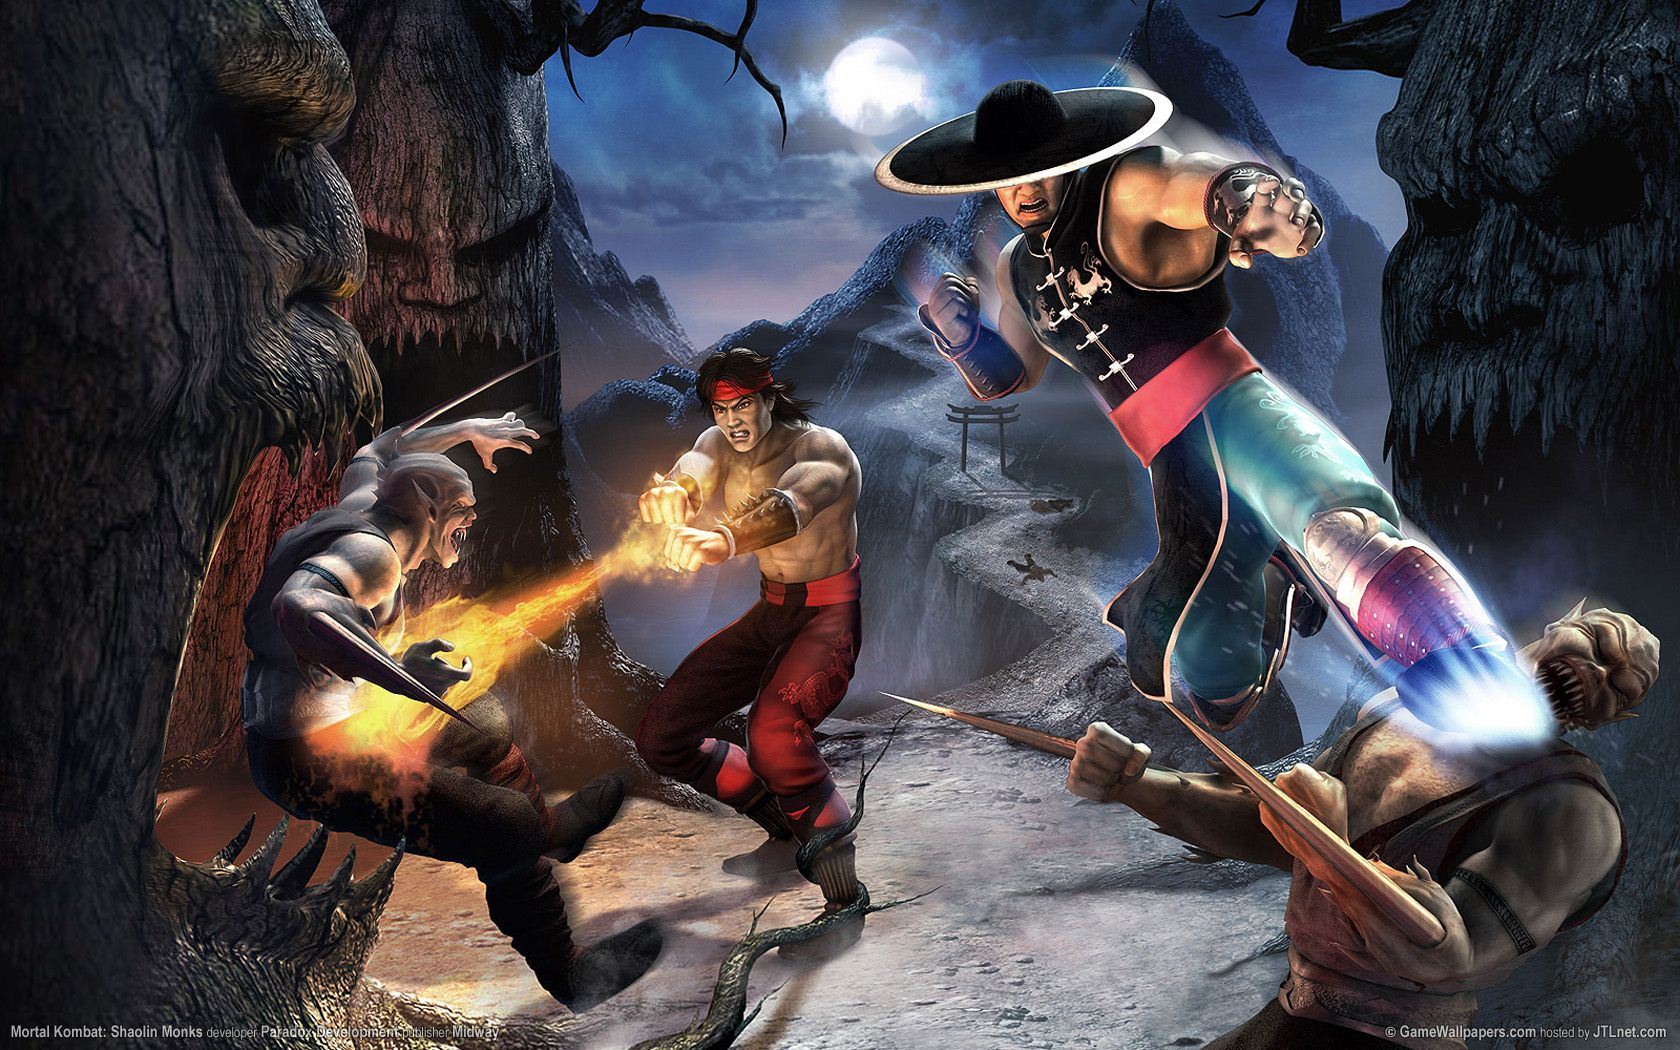 Mortal Kombat Wallpaper Mk Wallpapers Mortal Kombat Shaolin Monks Shaolin Monks Mortal Kombat